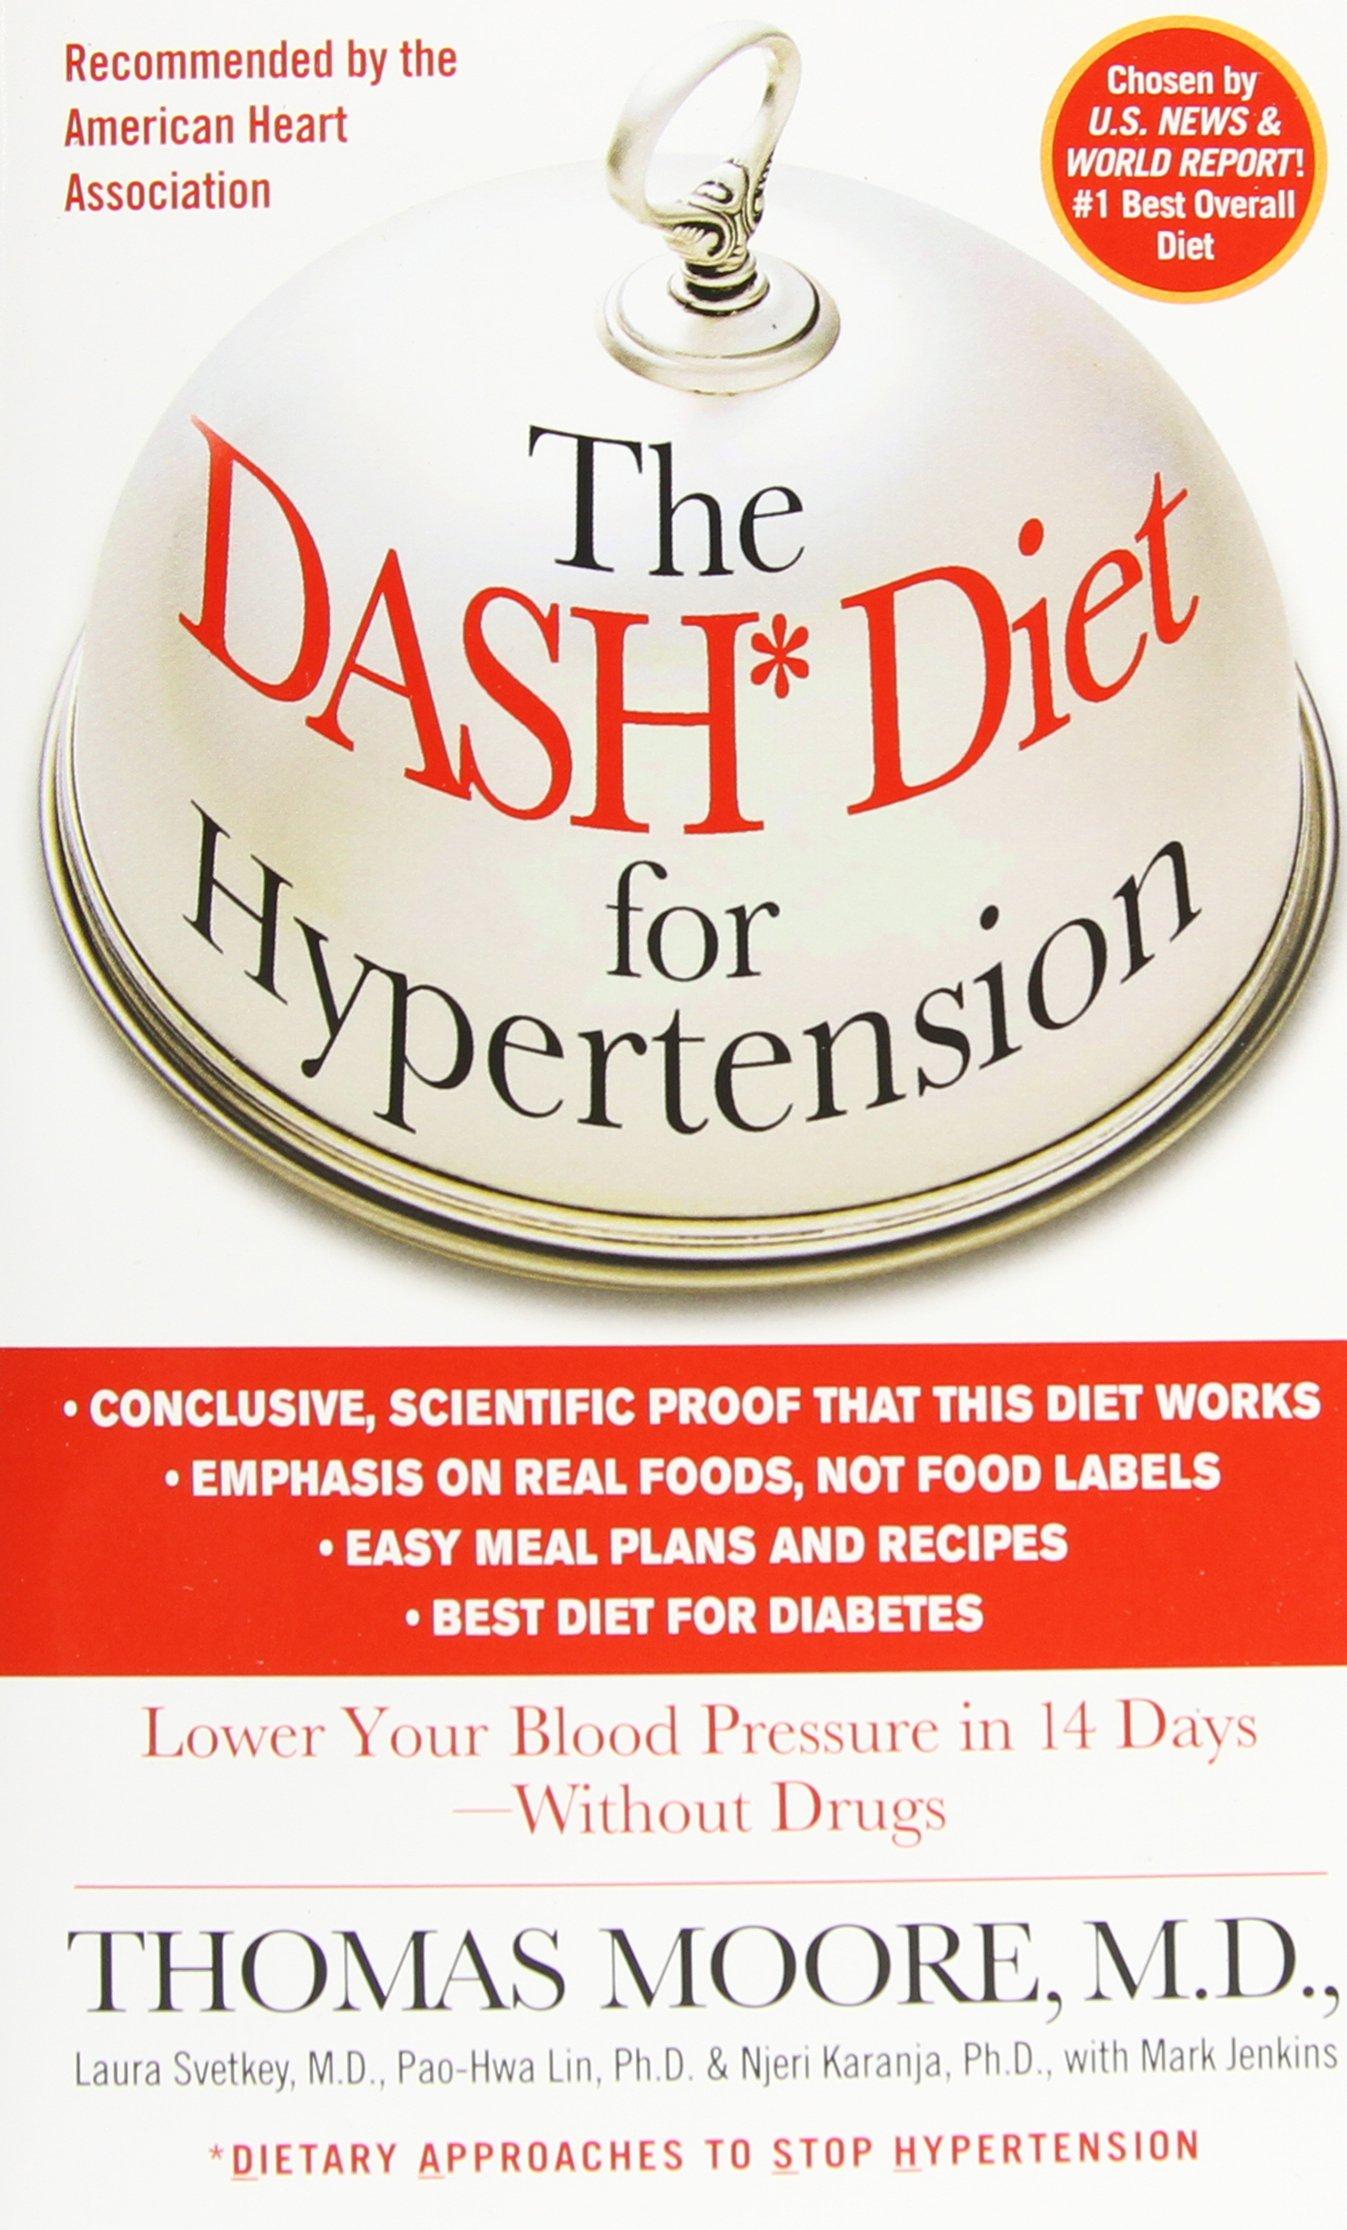 diet+plan+for+htn+patient